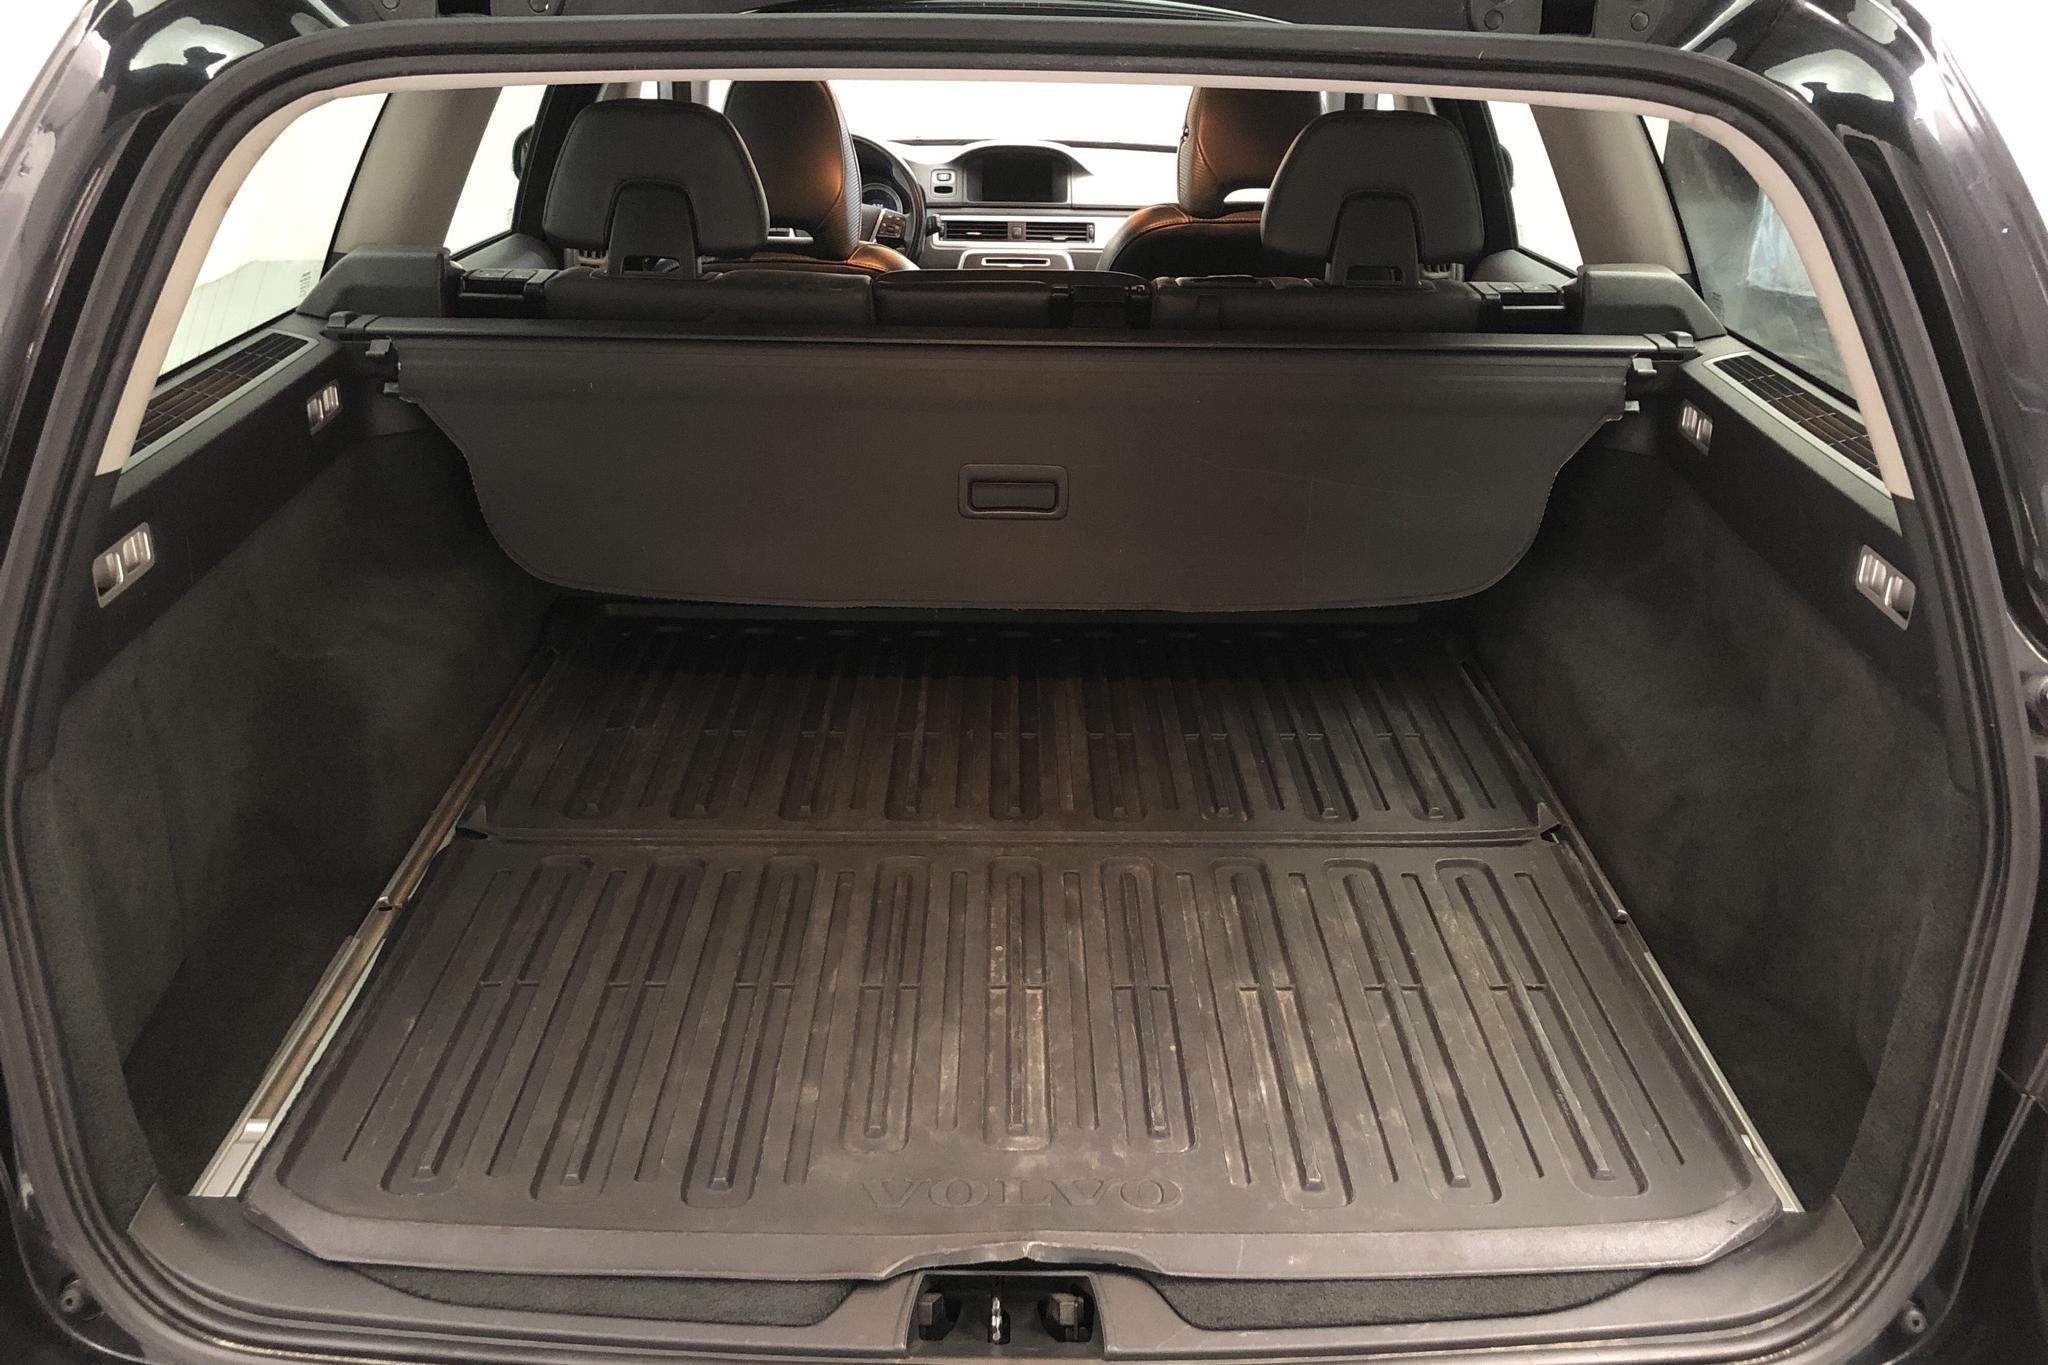 Volvo V70 II D4 (163hk) - 19 217 mil - Manuell - svart - 2013